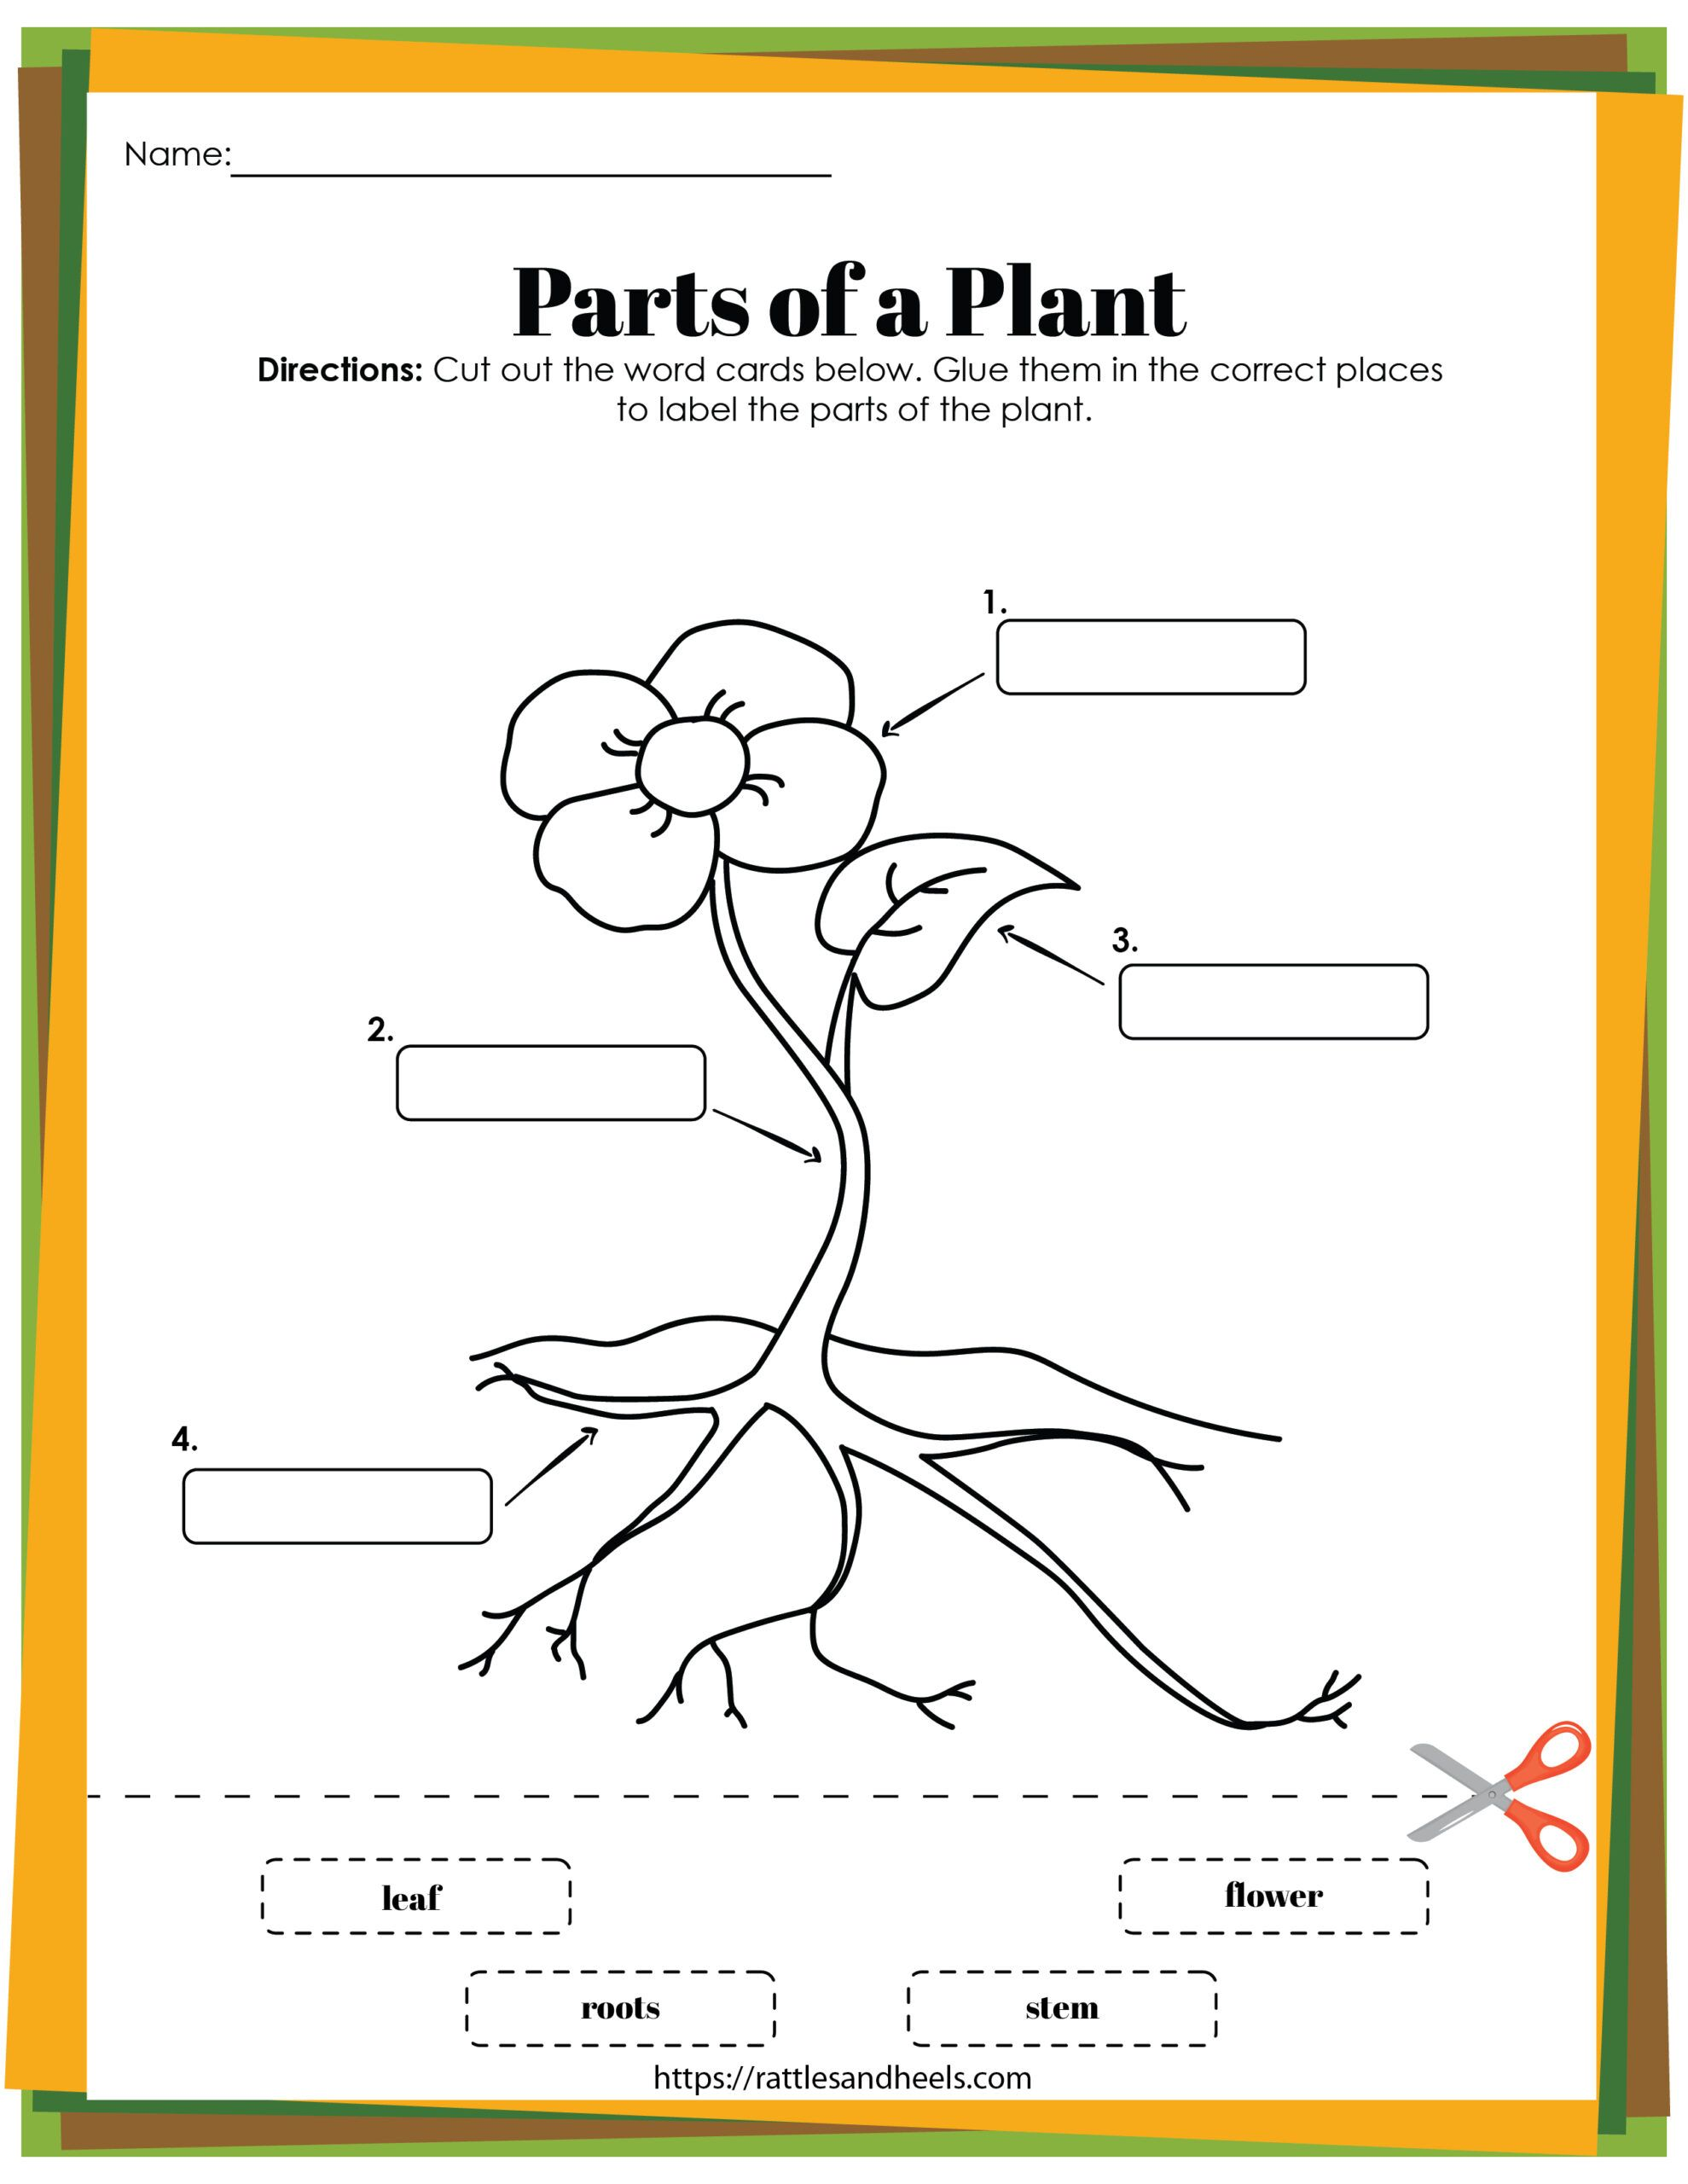 Plant Life Cycle Worksheets Free Printables For Kids Adanna Dill Plant Life Cycle Worksheet Plant Life Cycle Free Printable Worksheets